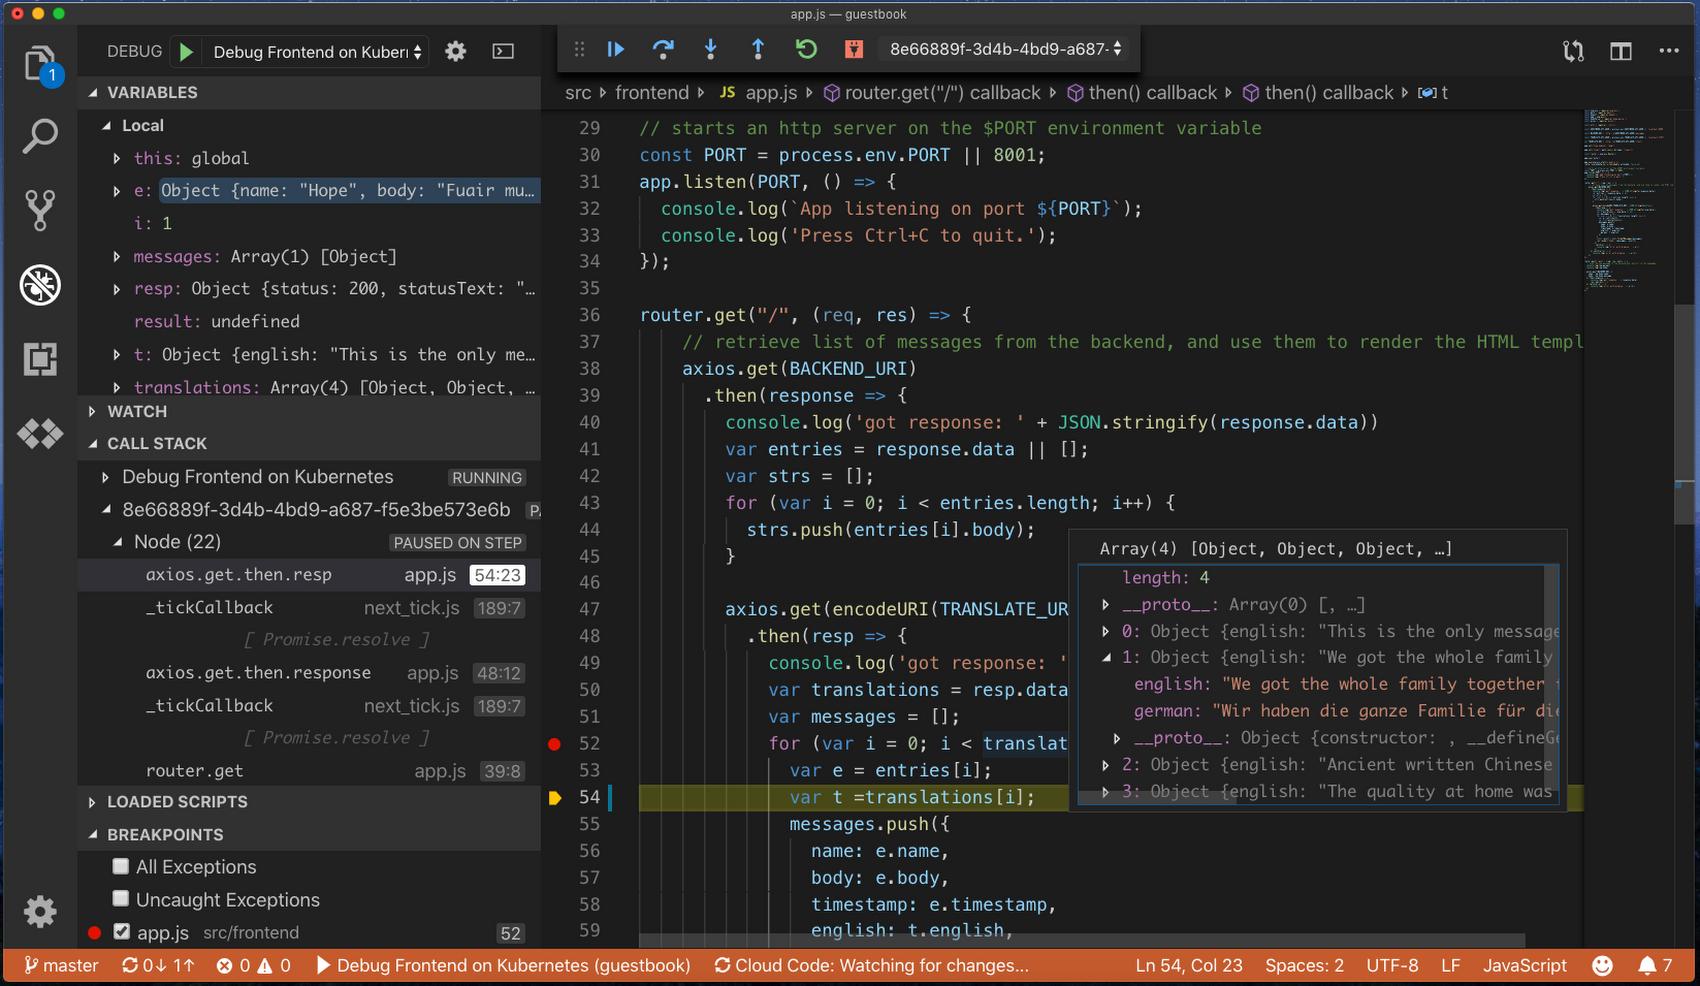 Cloud Code for VS Code